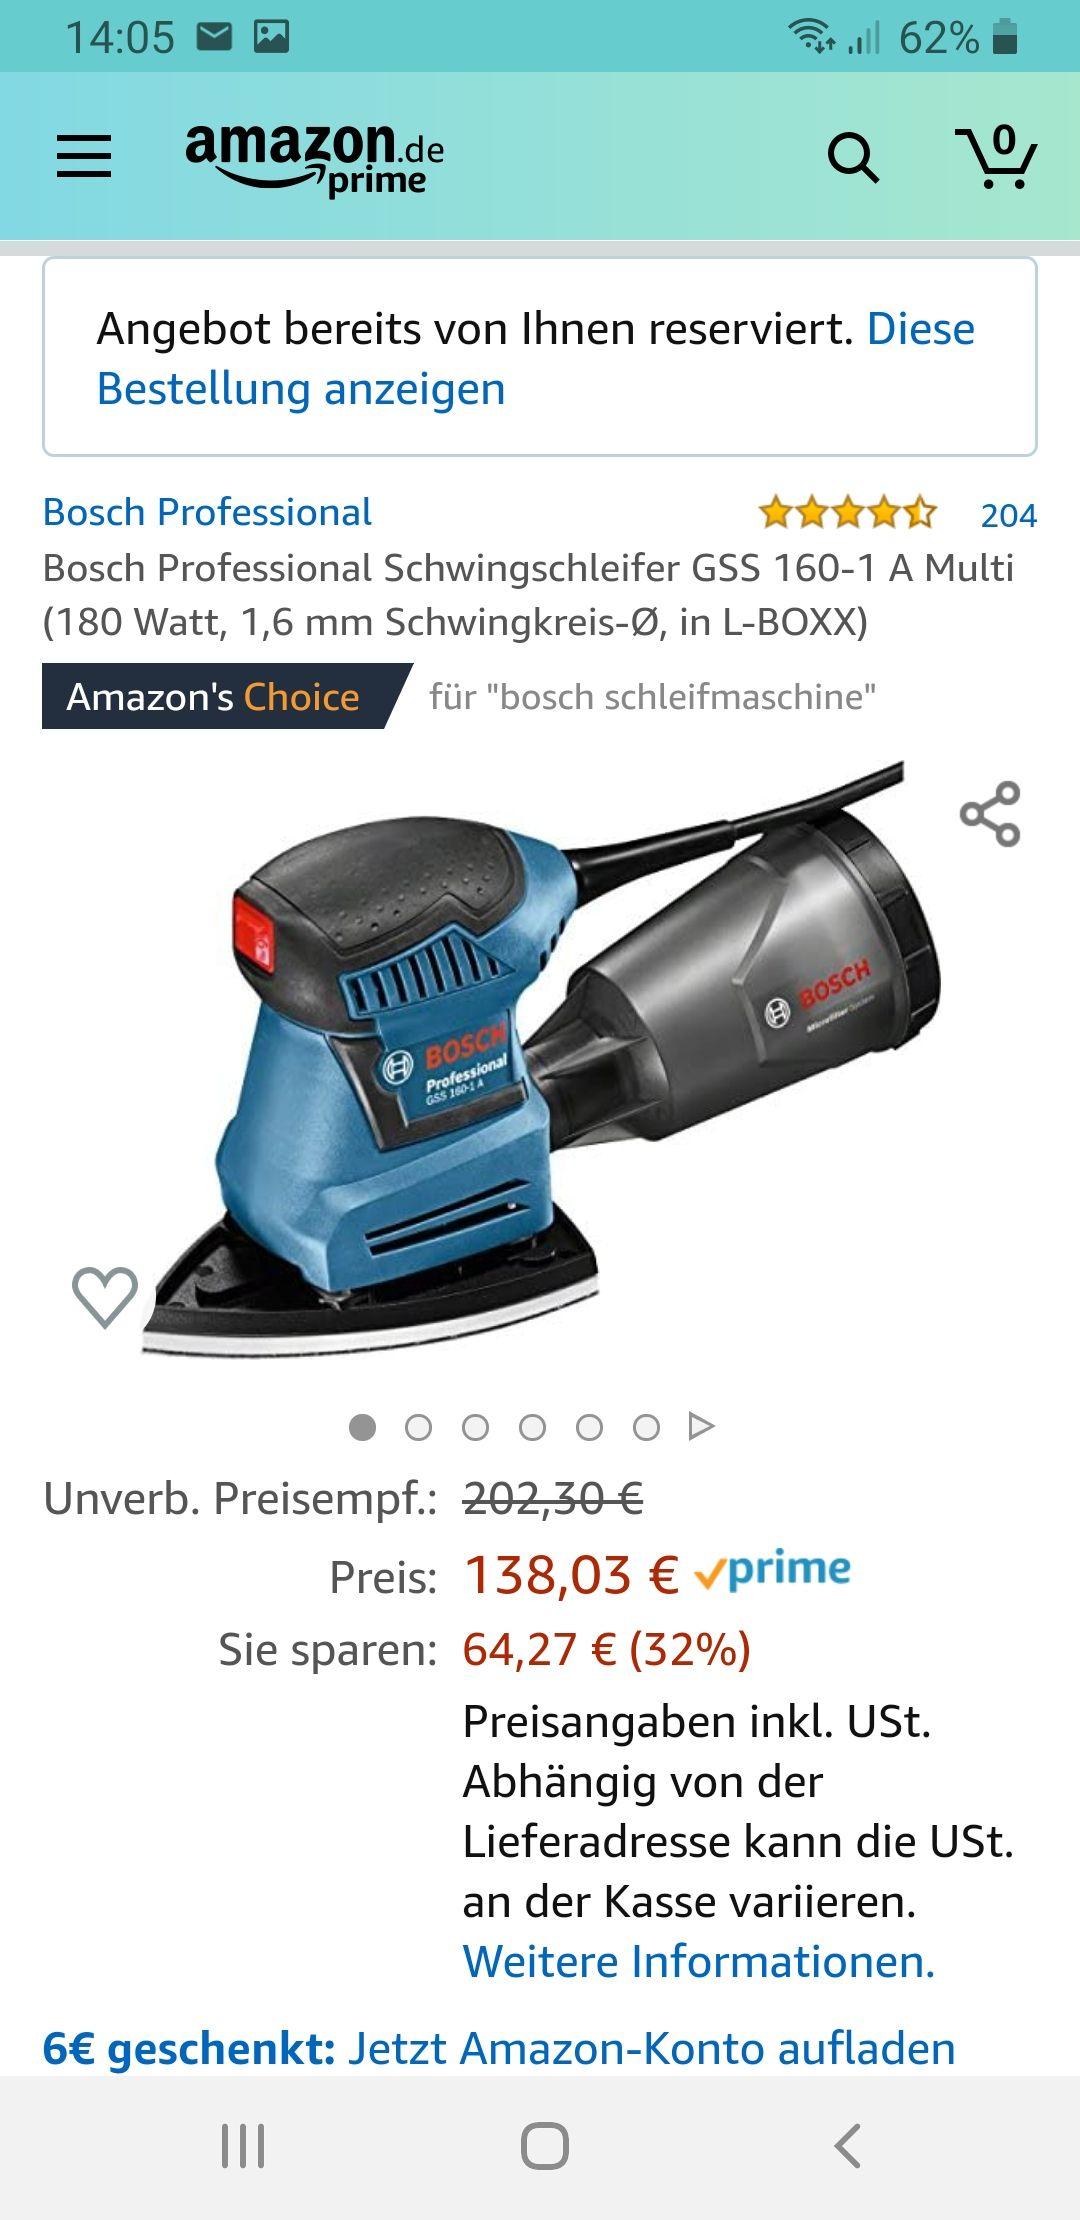 Bosch Professional Schwingschleifer GSS 160-1 A Multi in L-Boxx